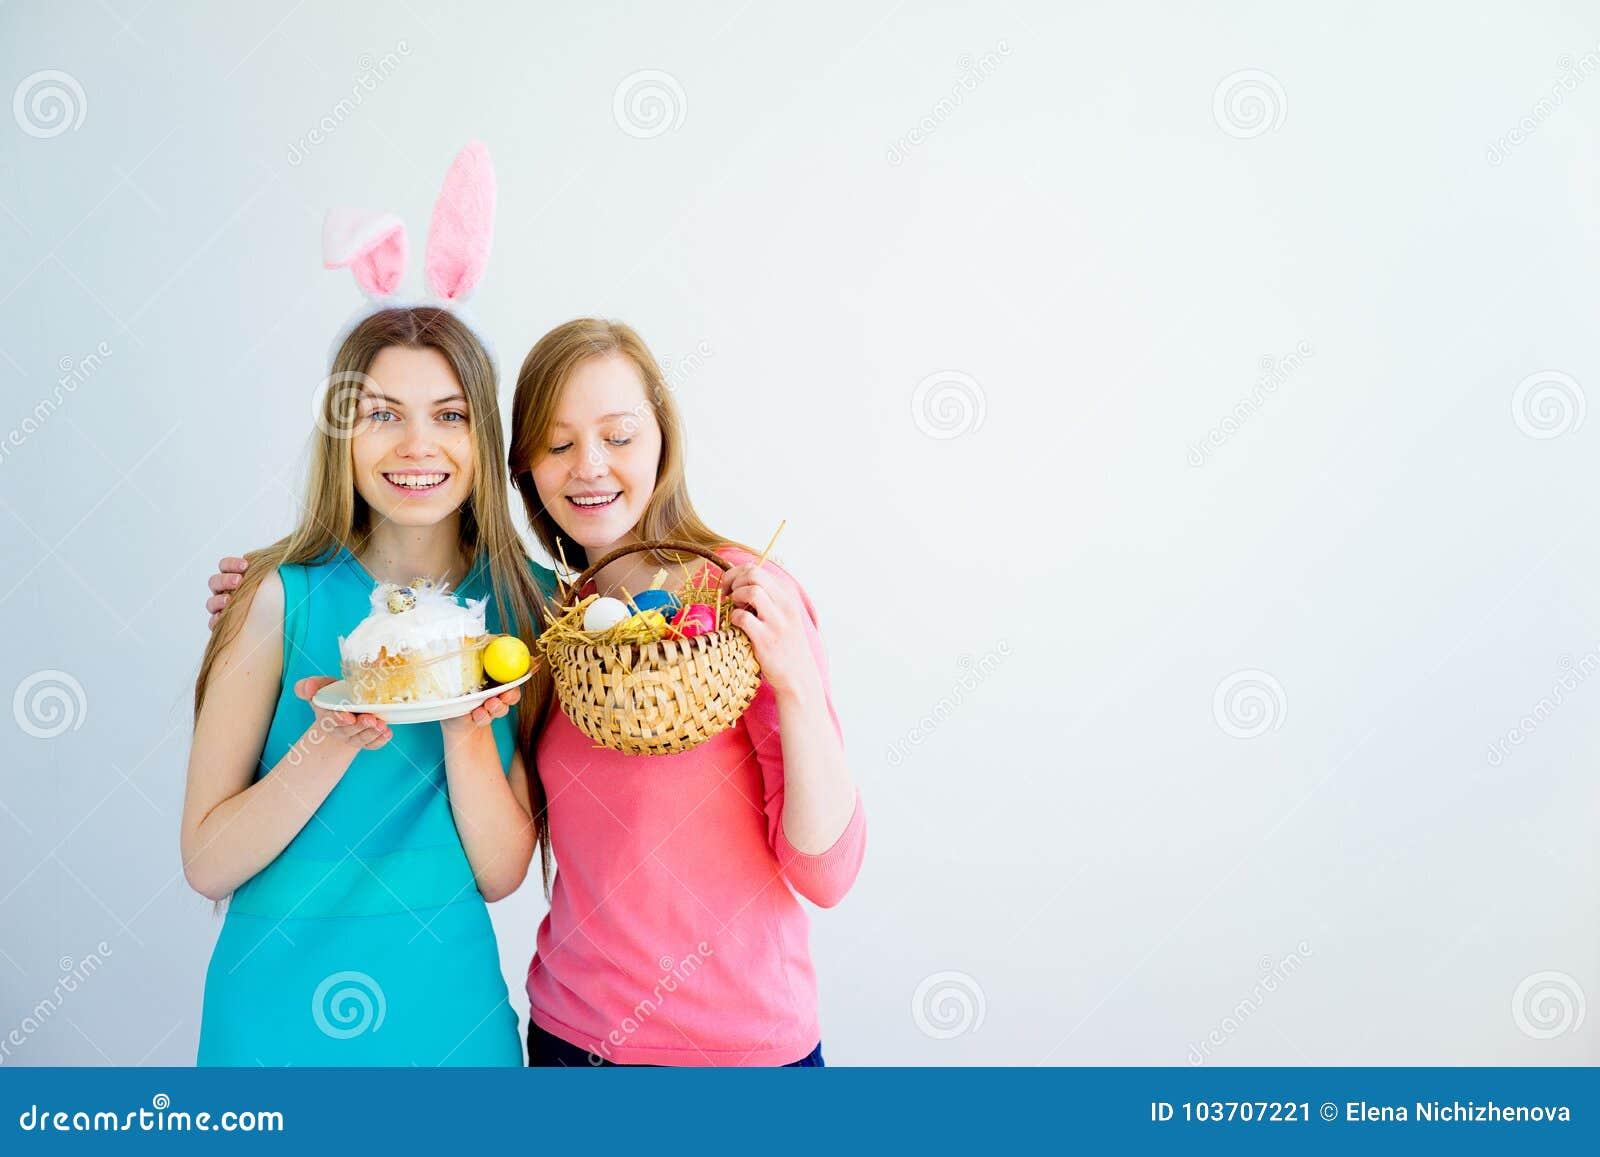 roxanne-topless-bunny-teen-pics-free-chubby